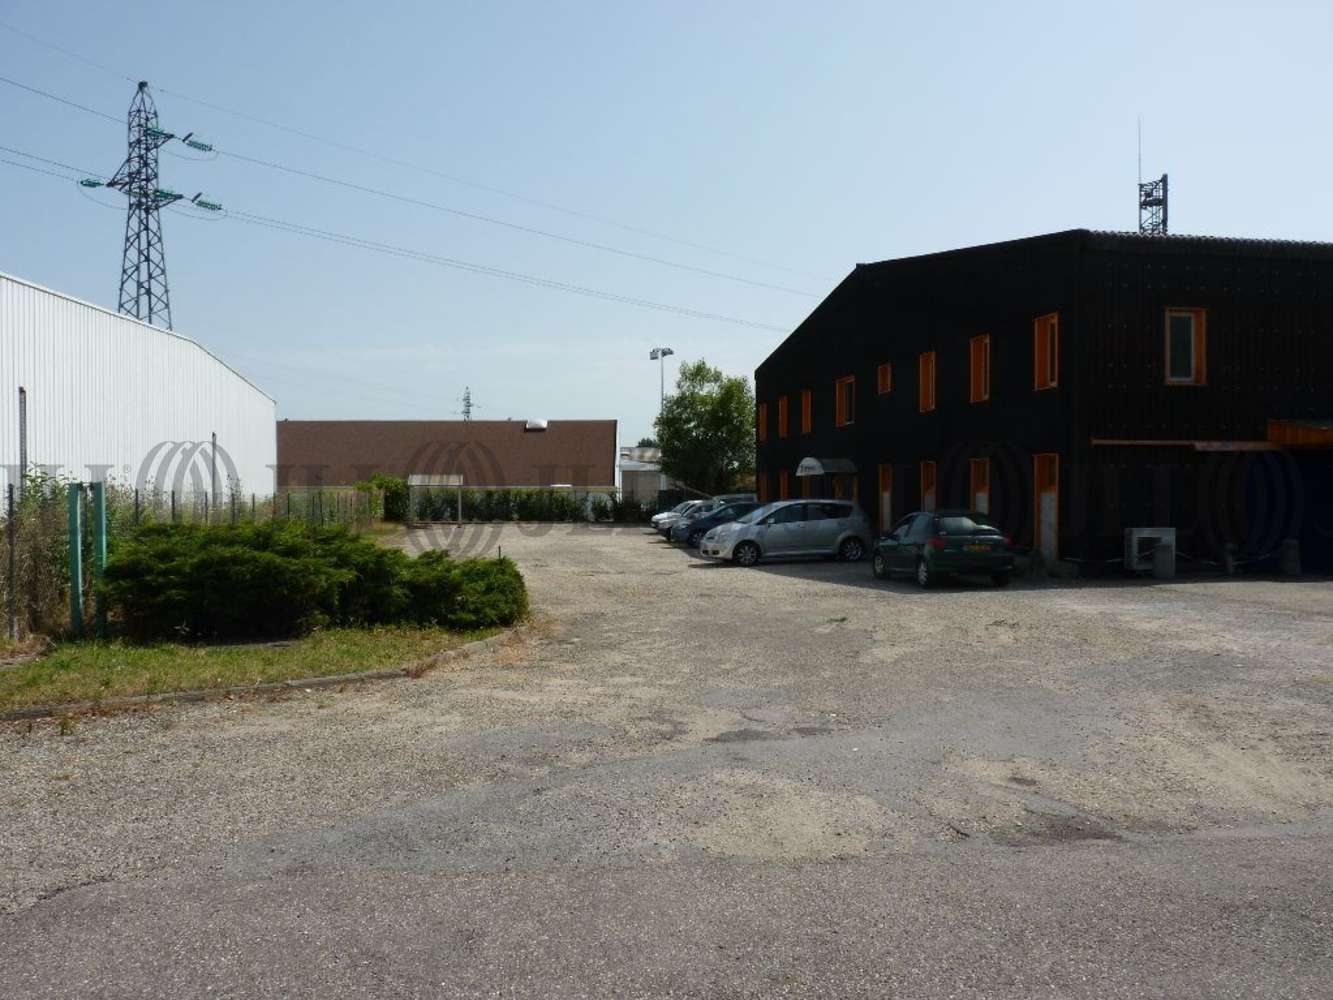 Activités/entrepôt Givors, 69700 - Location entrepot - Proche Lyon (69) - 10044601